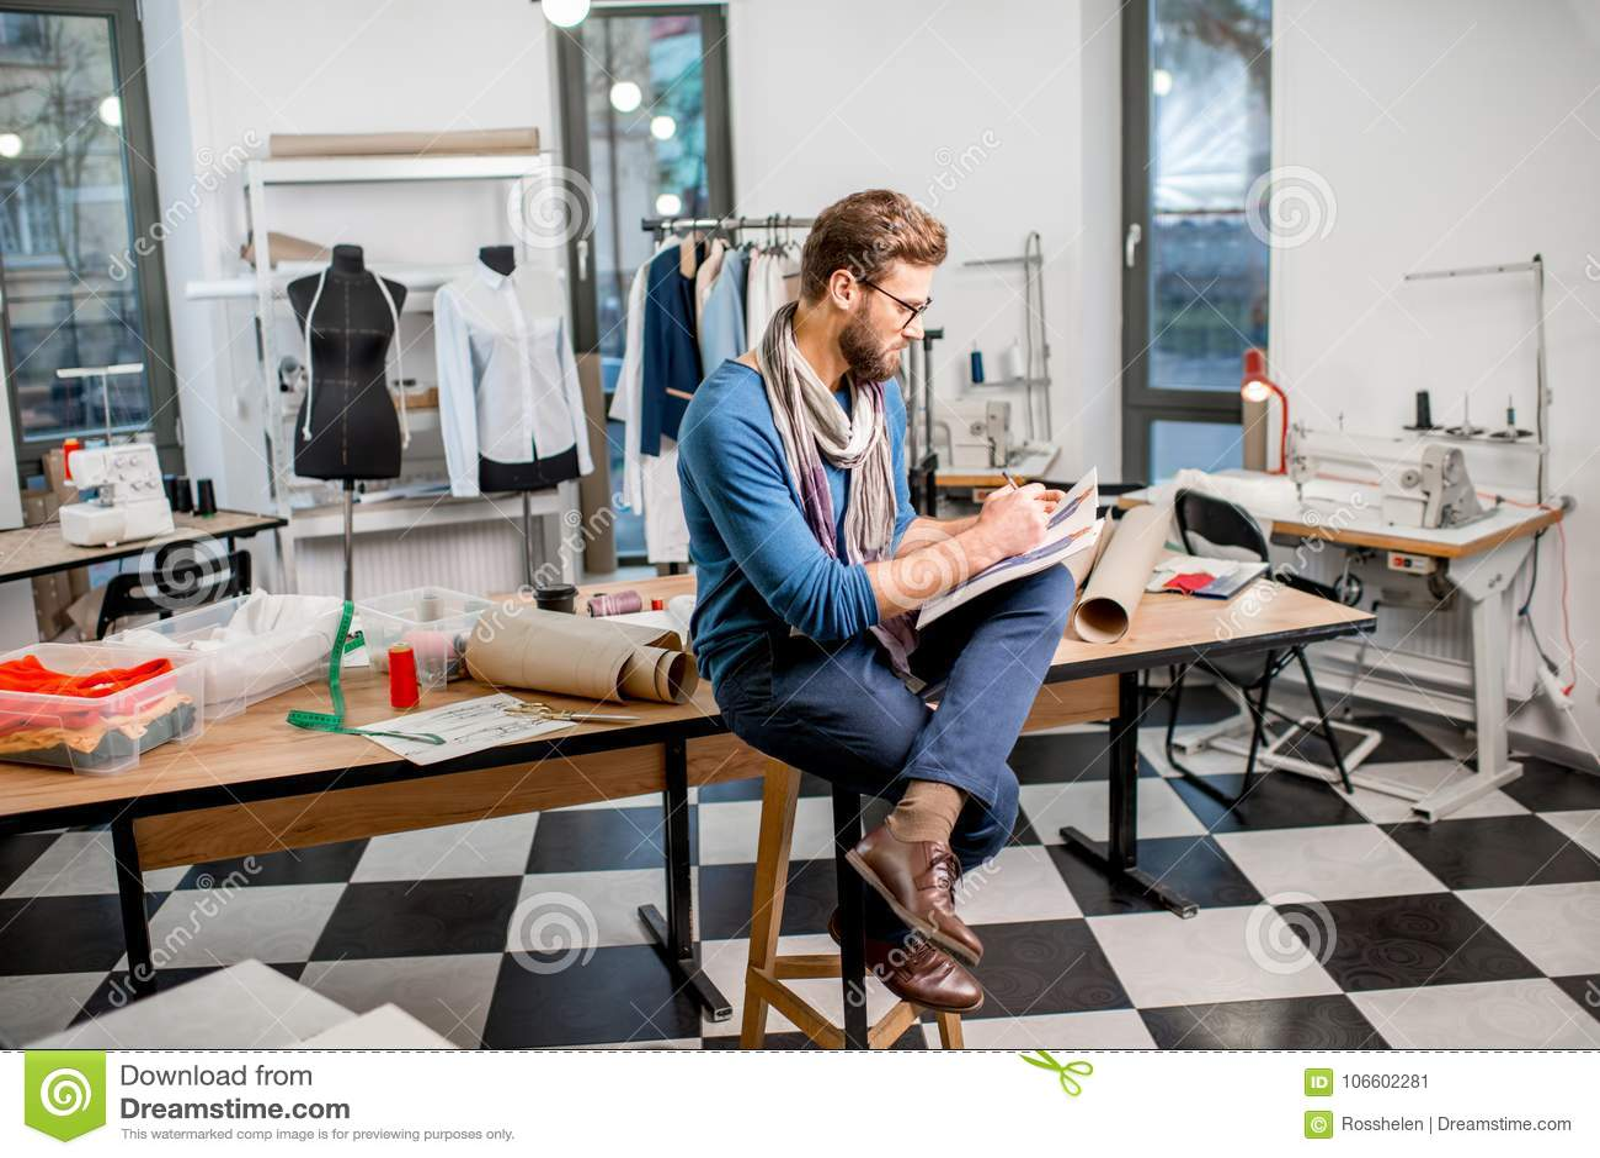 Fashion Designer At The Studio Stock Image Image Of Profession Business 106602281